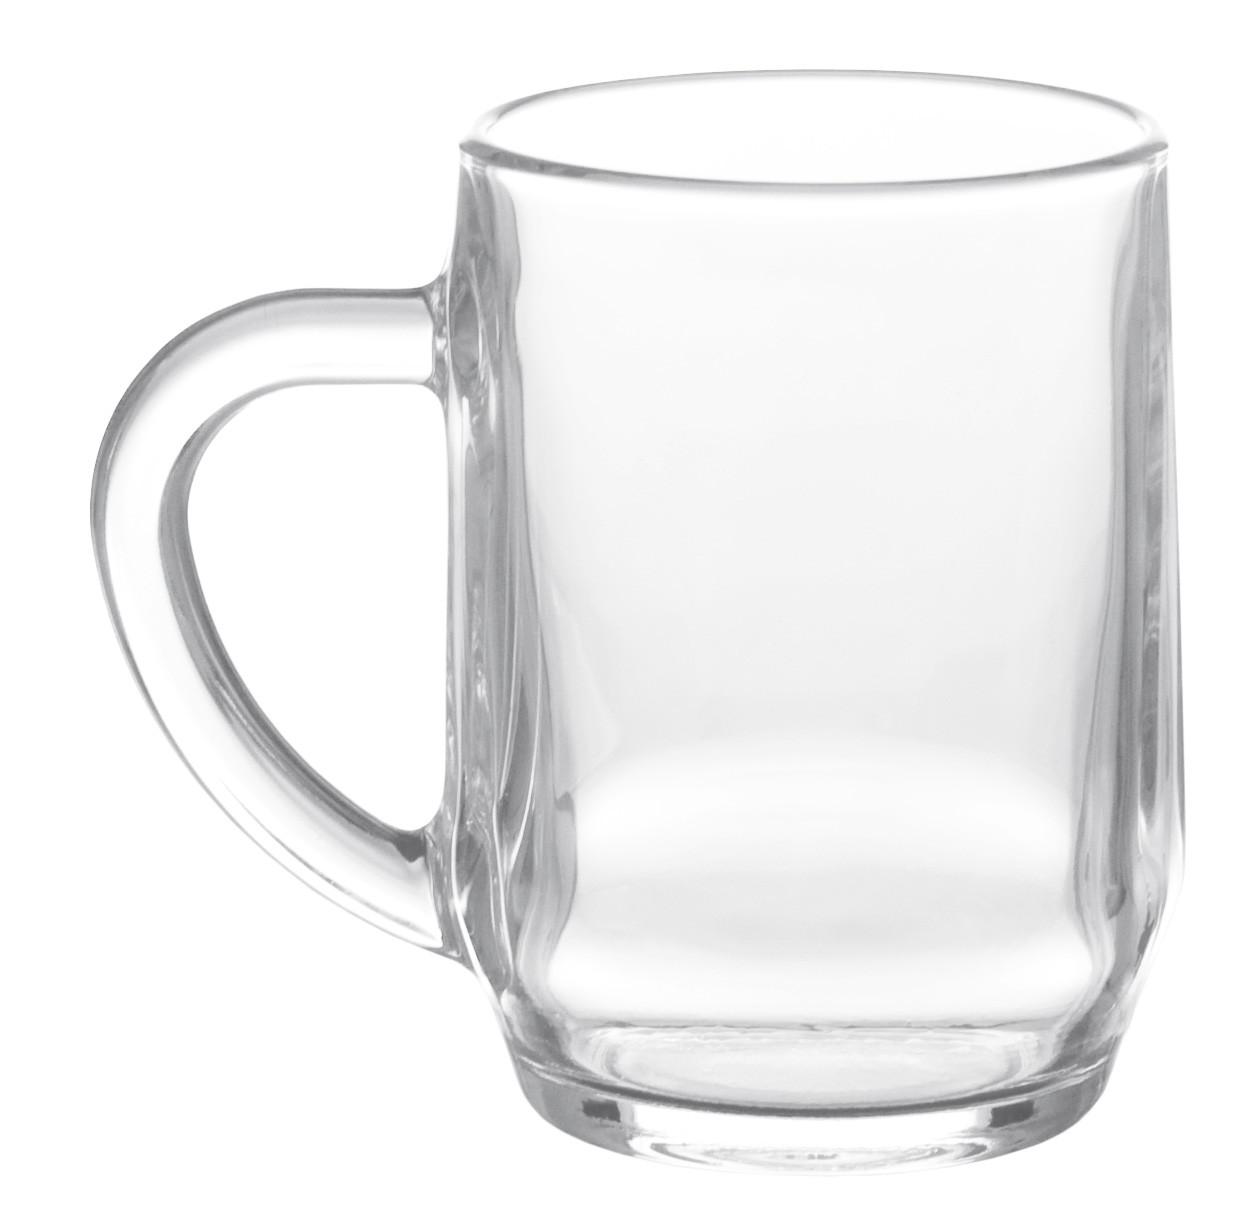 Noleggio bicchieri bicchieri da birra for Bicchieri birra prezzi